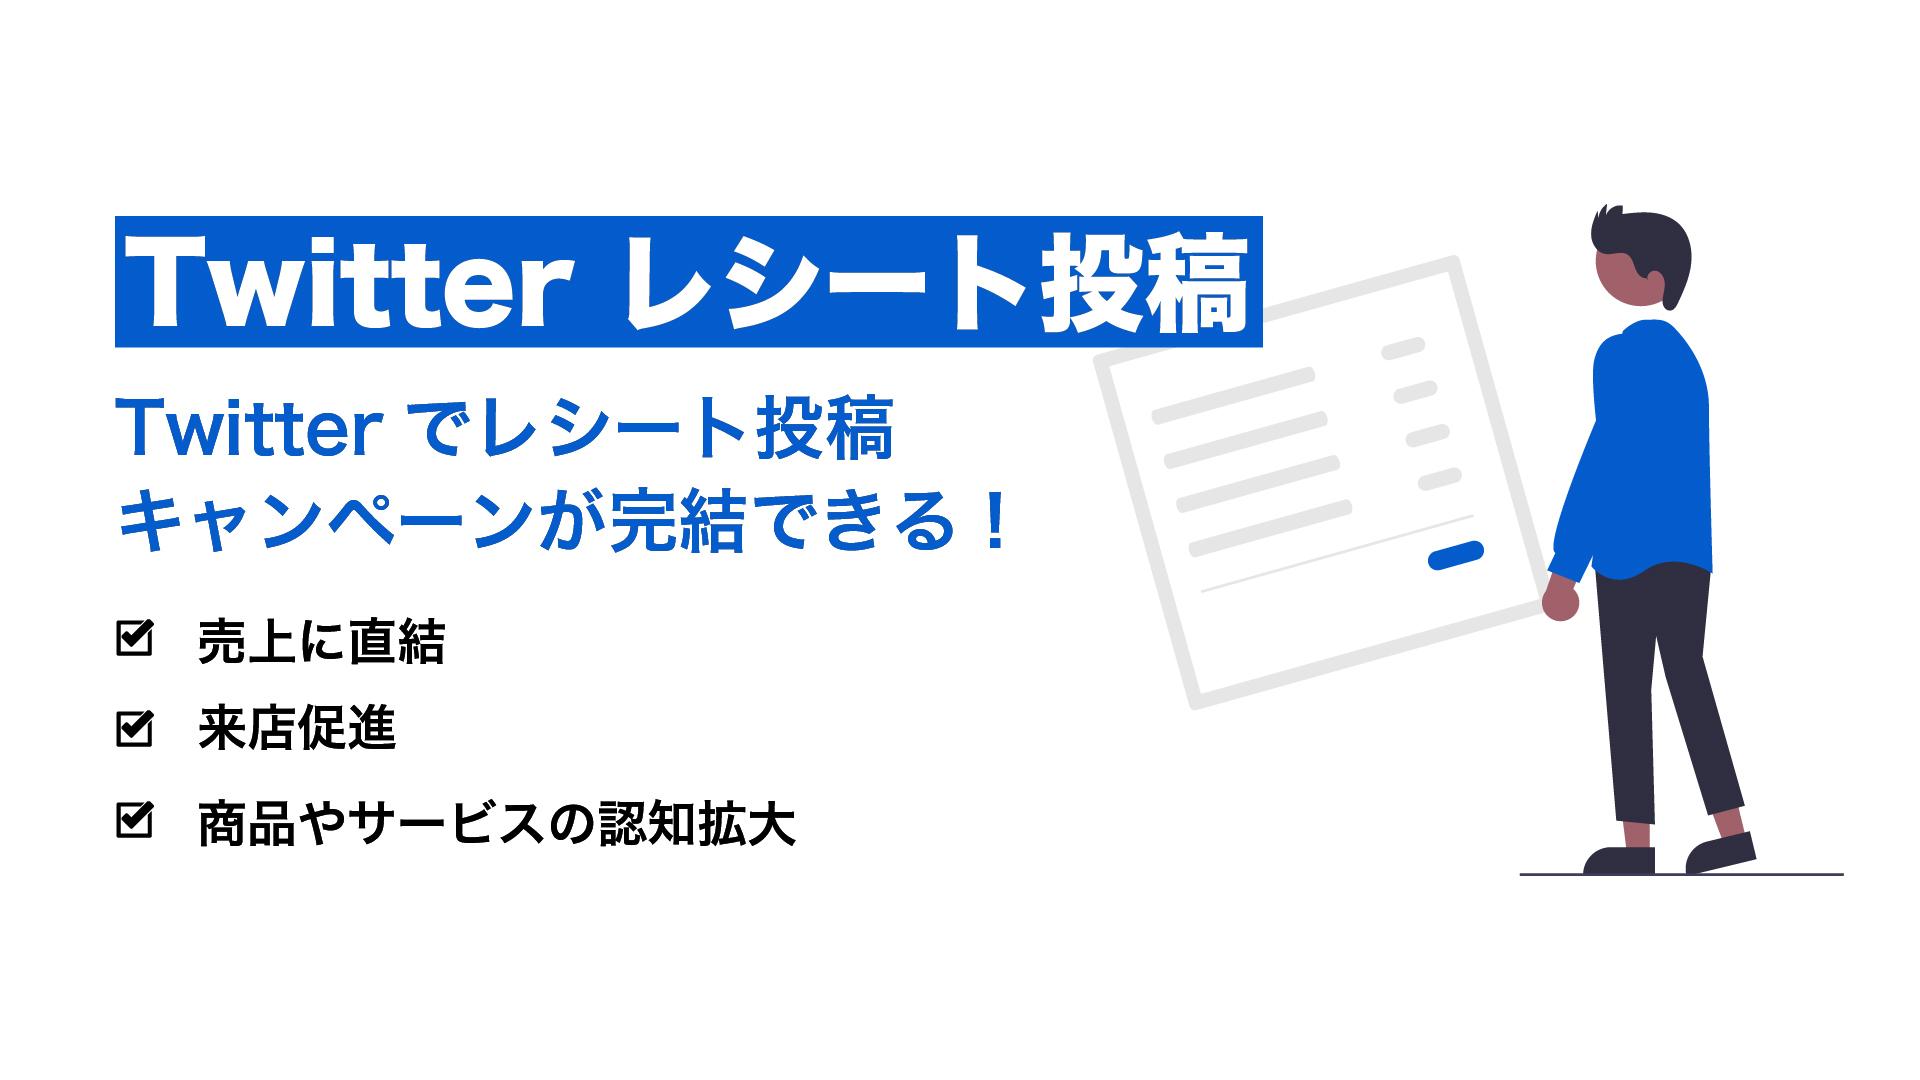 BlueBird Flock Twitterインスタントウィン・キャンペーンツール